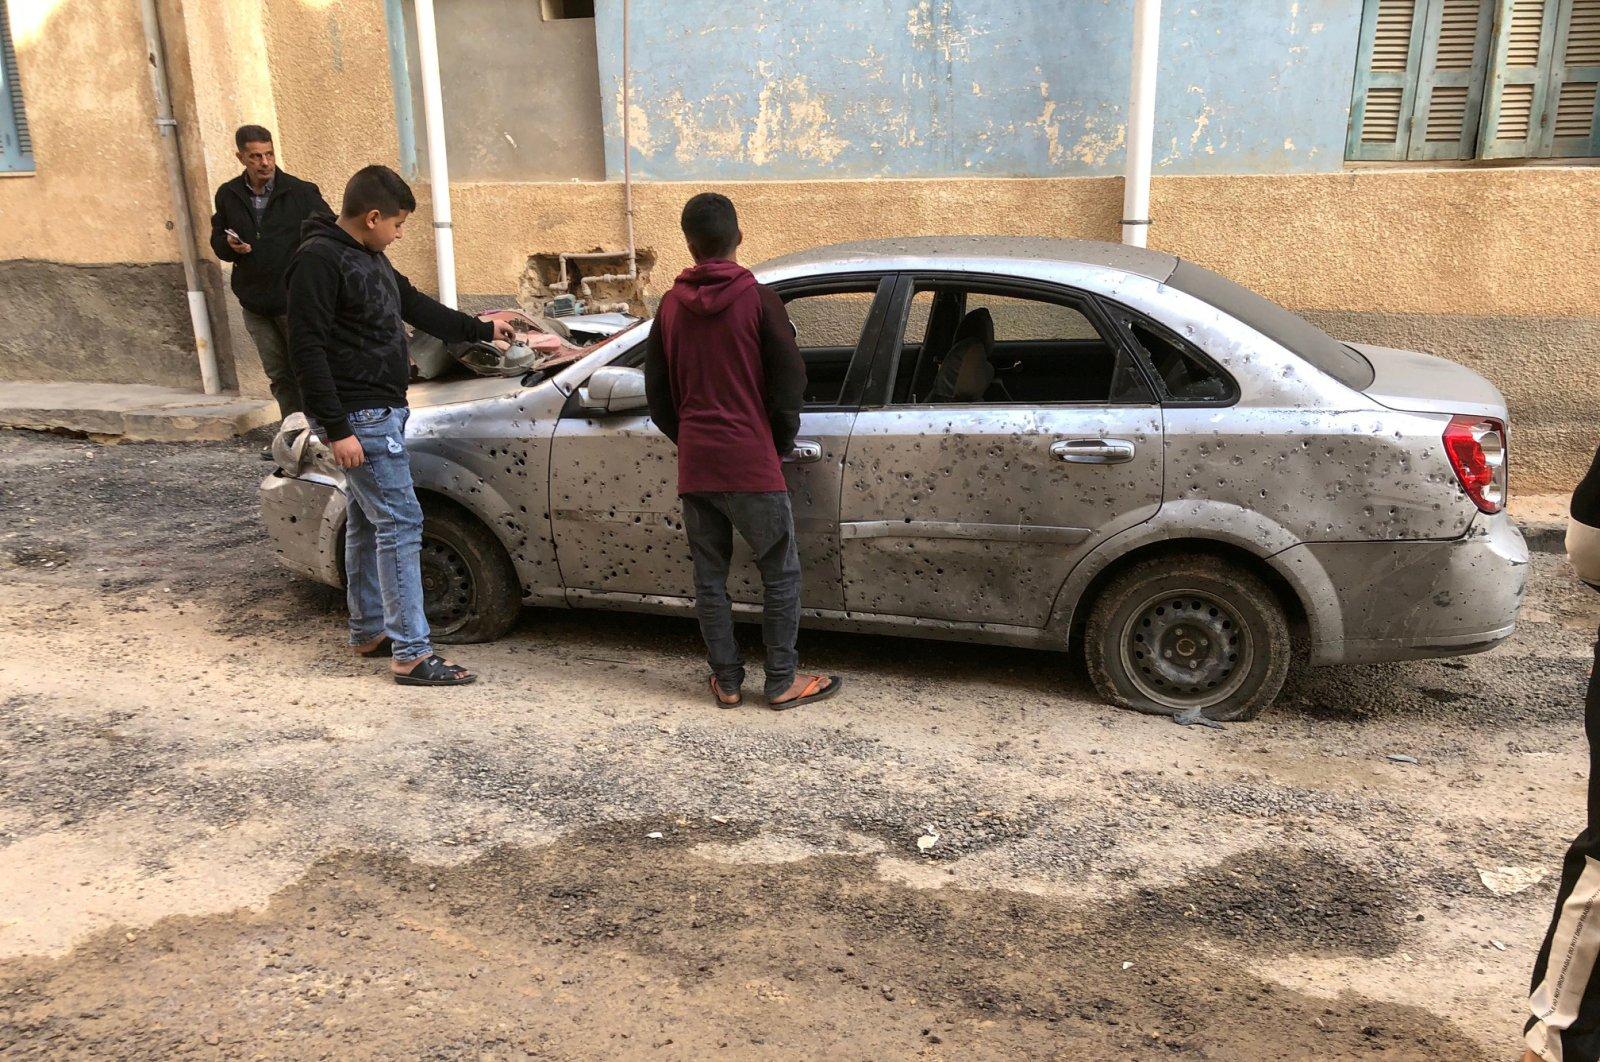 Libyan boys check a damaged car after a shell fell on a residential area of Hadba al-Badri district, in Tripoli, Libya, Jan. 28, 2020. (Reuters Photo)